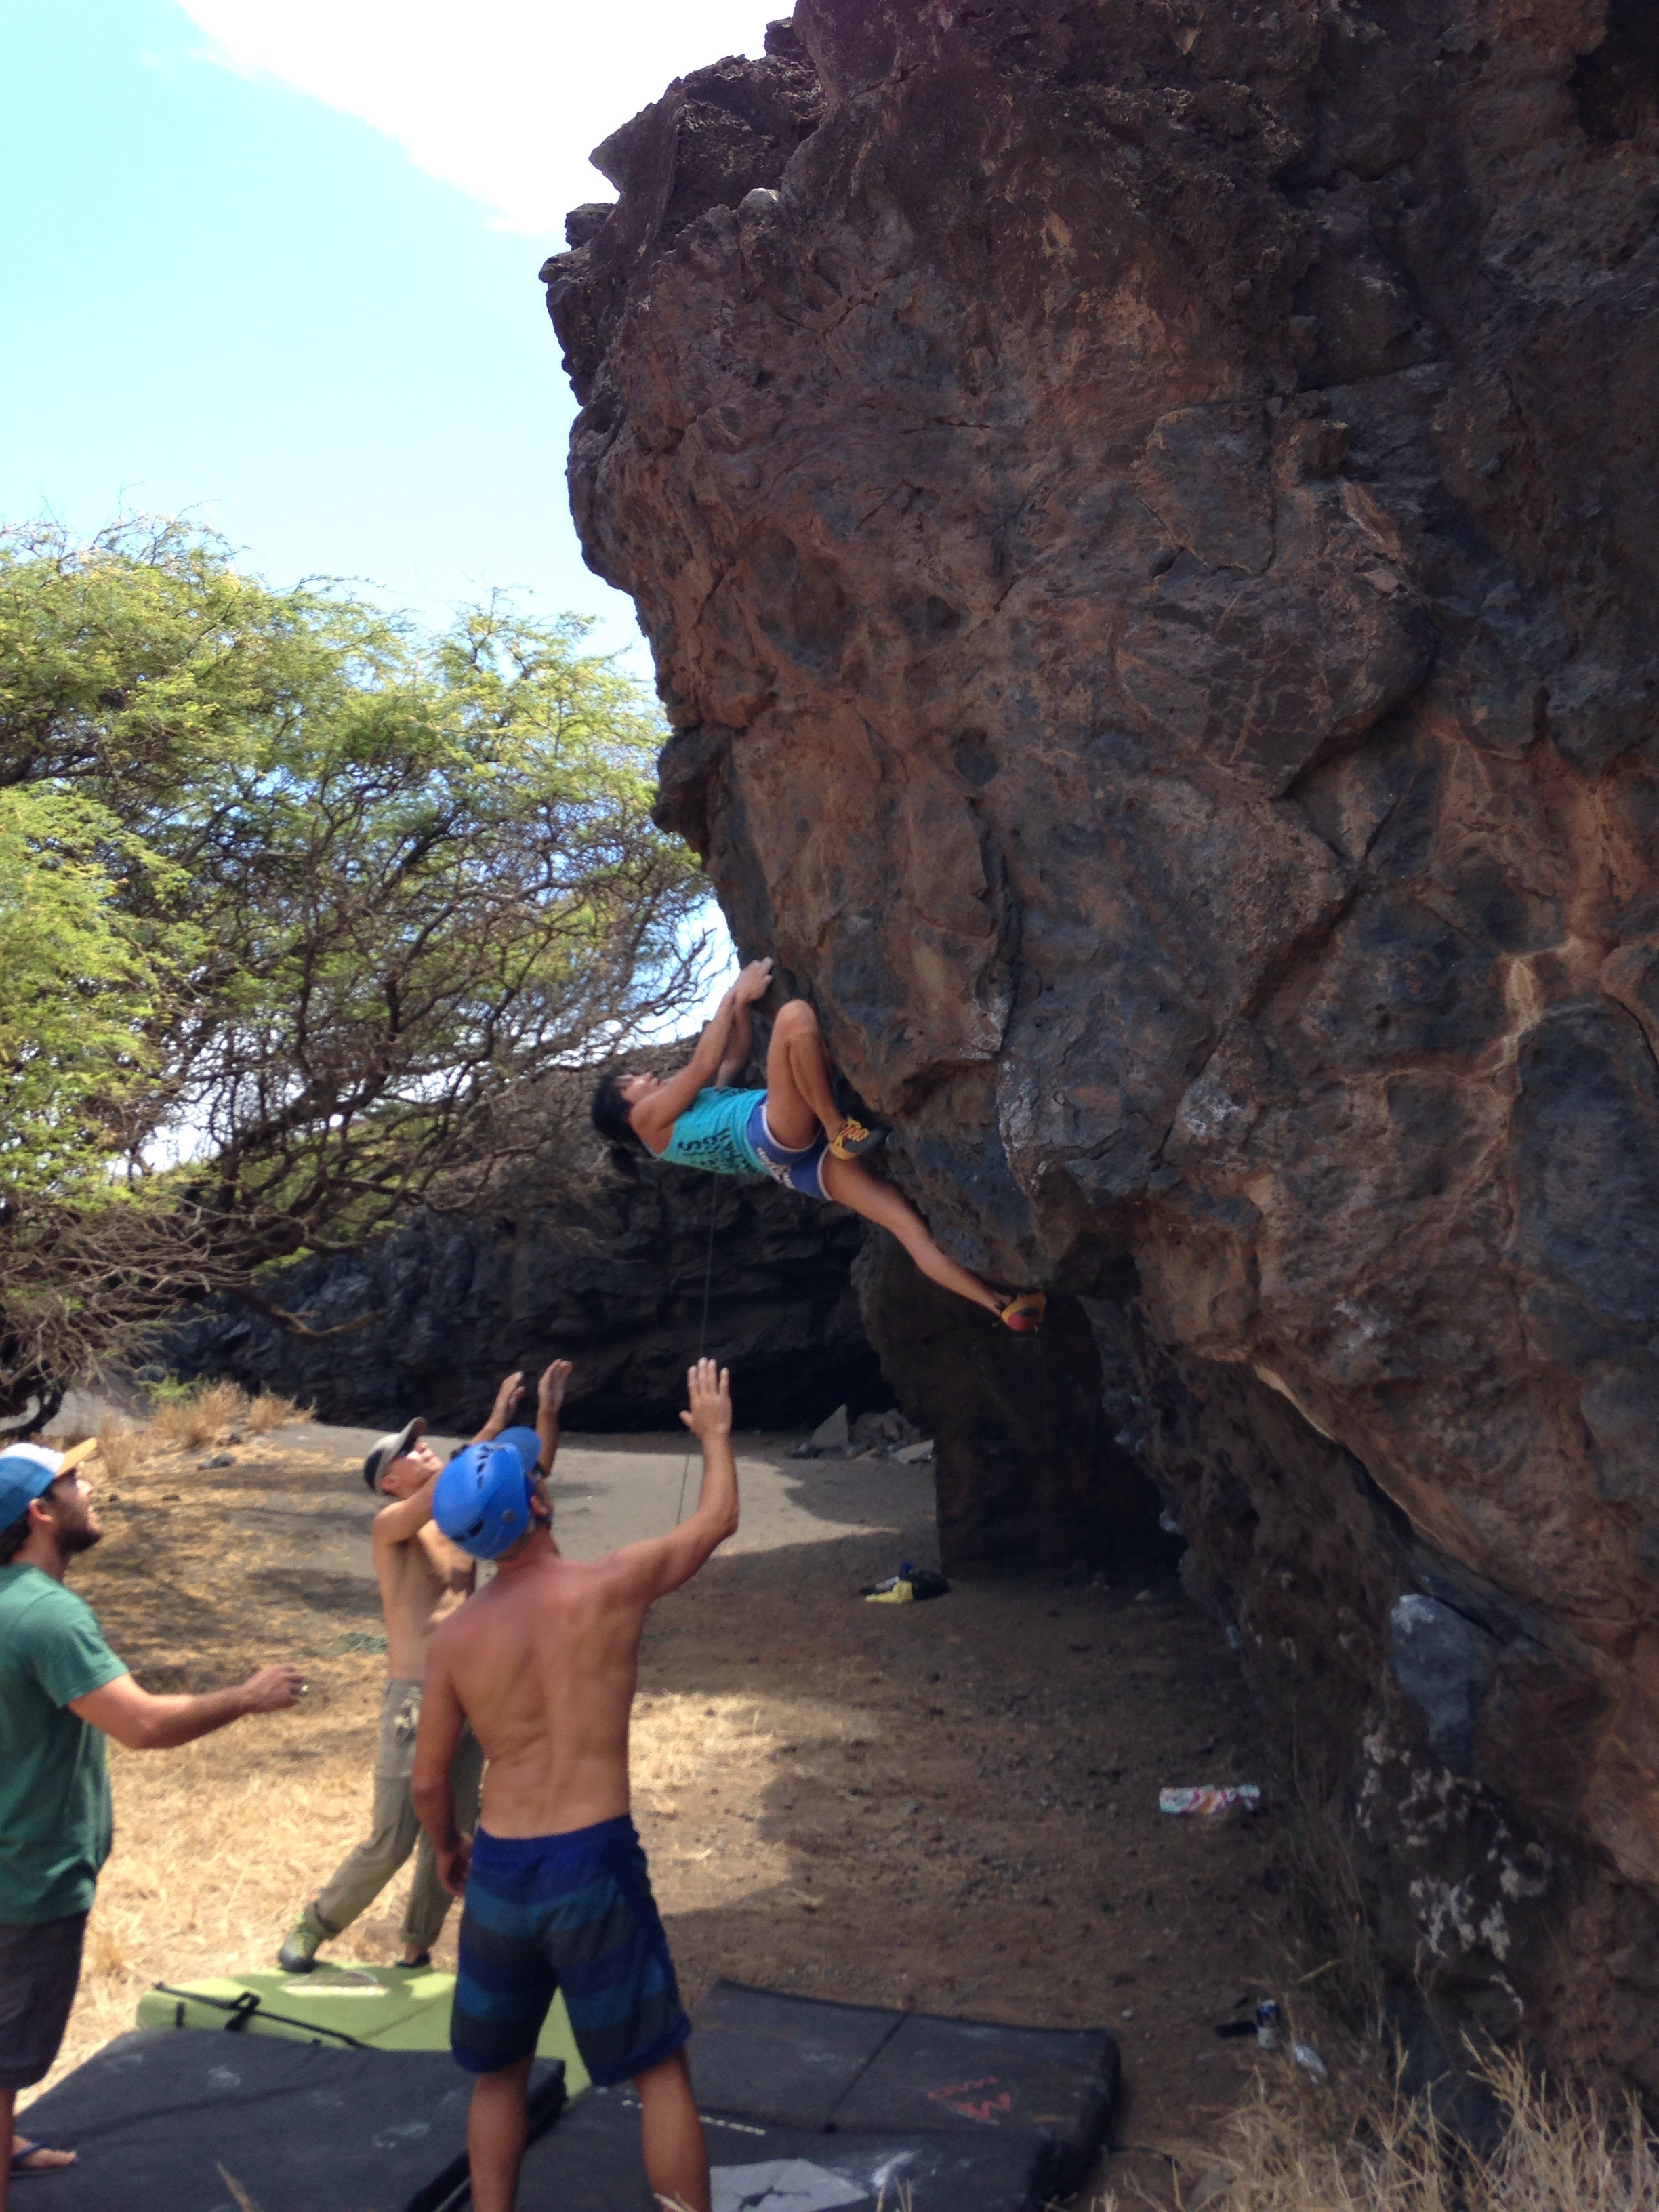 Wai Yi on a fun V4ish arête a stone's throw from Piilani highway near PK. PC: Matt